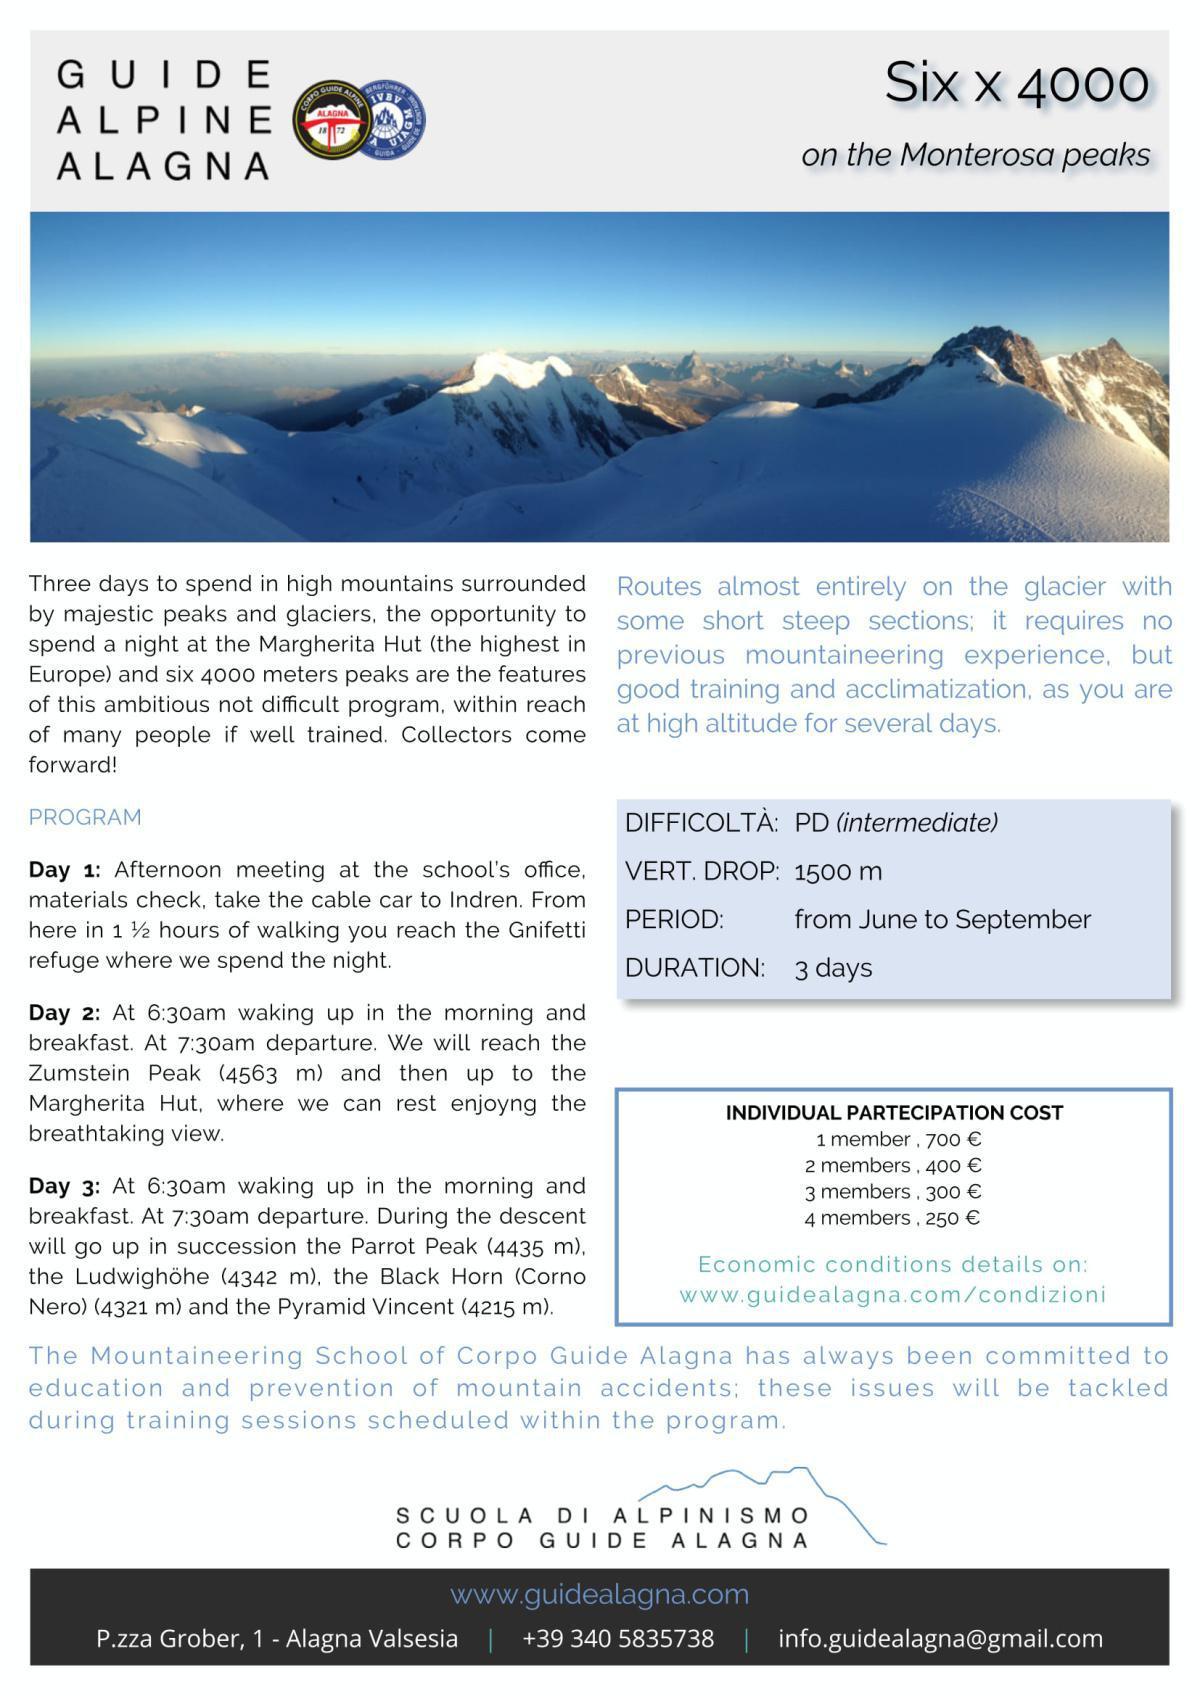 Sei x 4000 - Guide Alpine Alagna